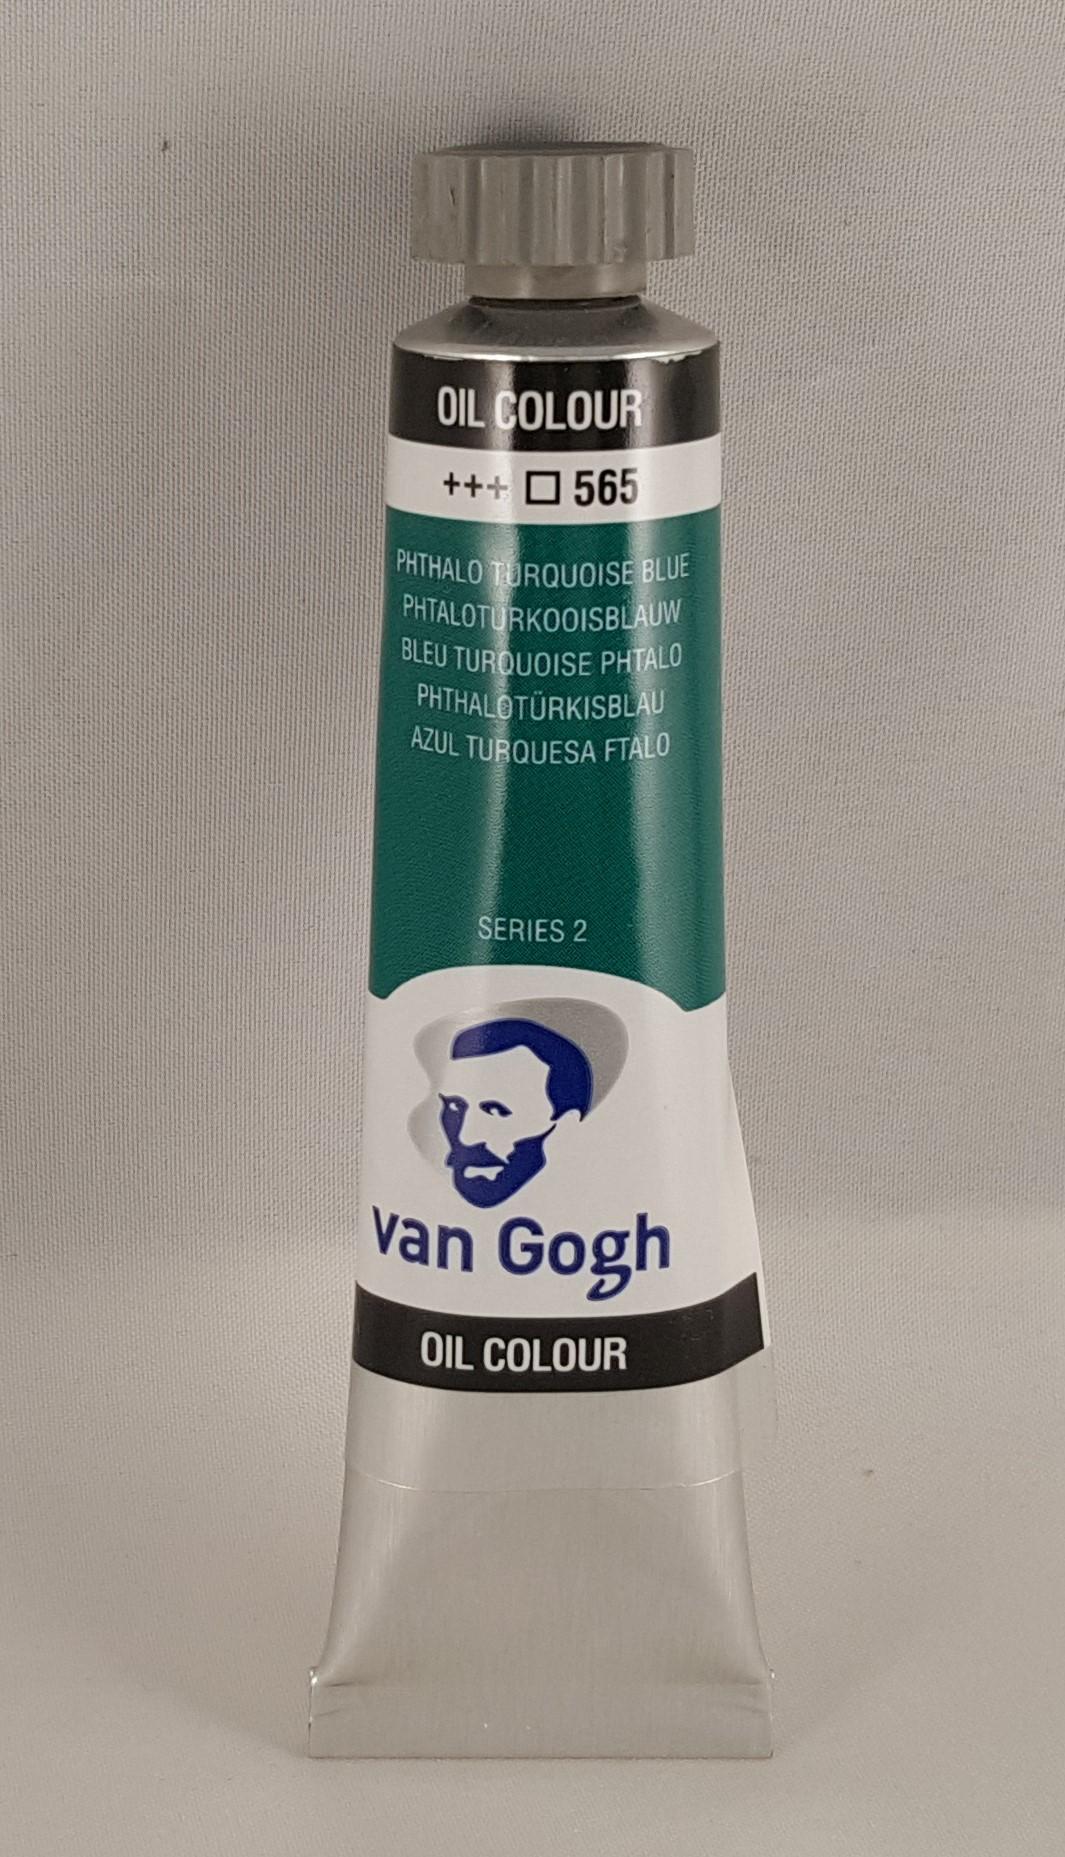 Tinta de óleo Van Gogh phthalo turquoise blue